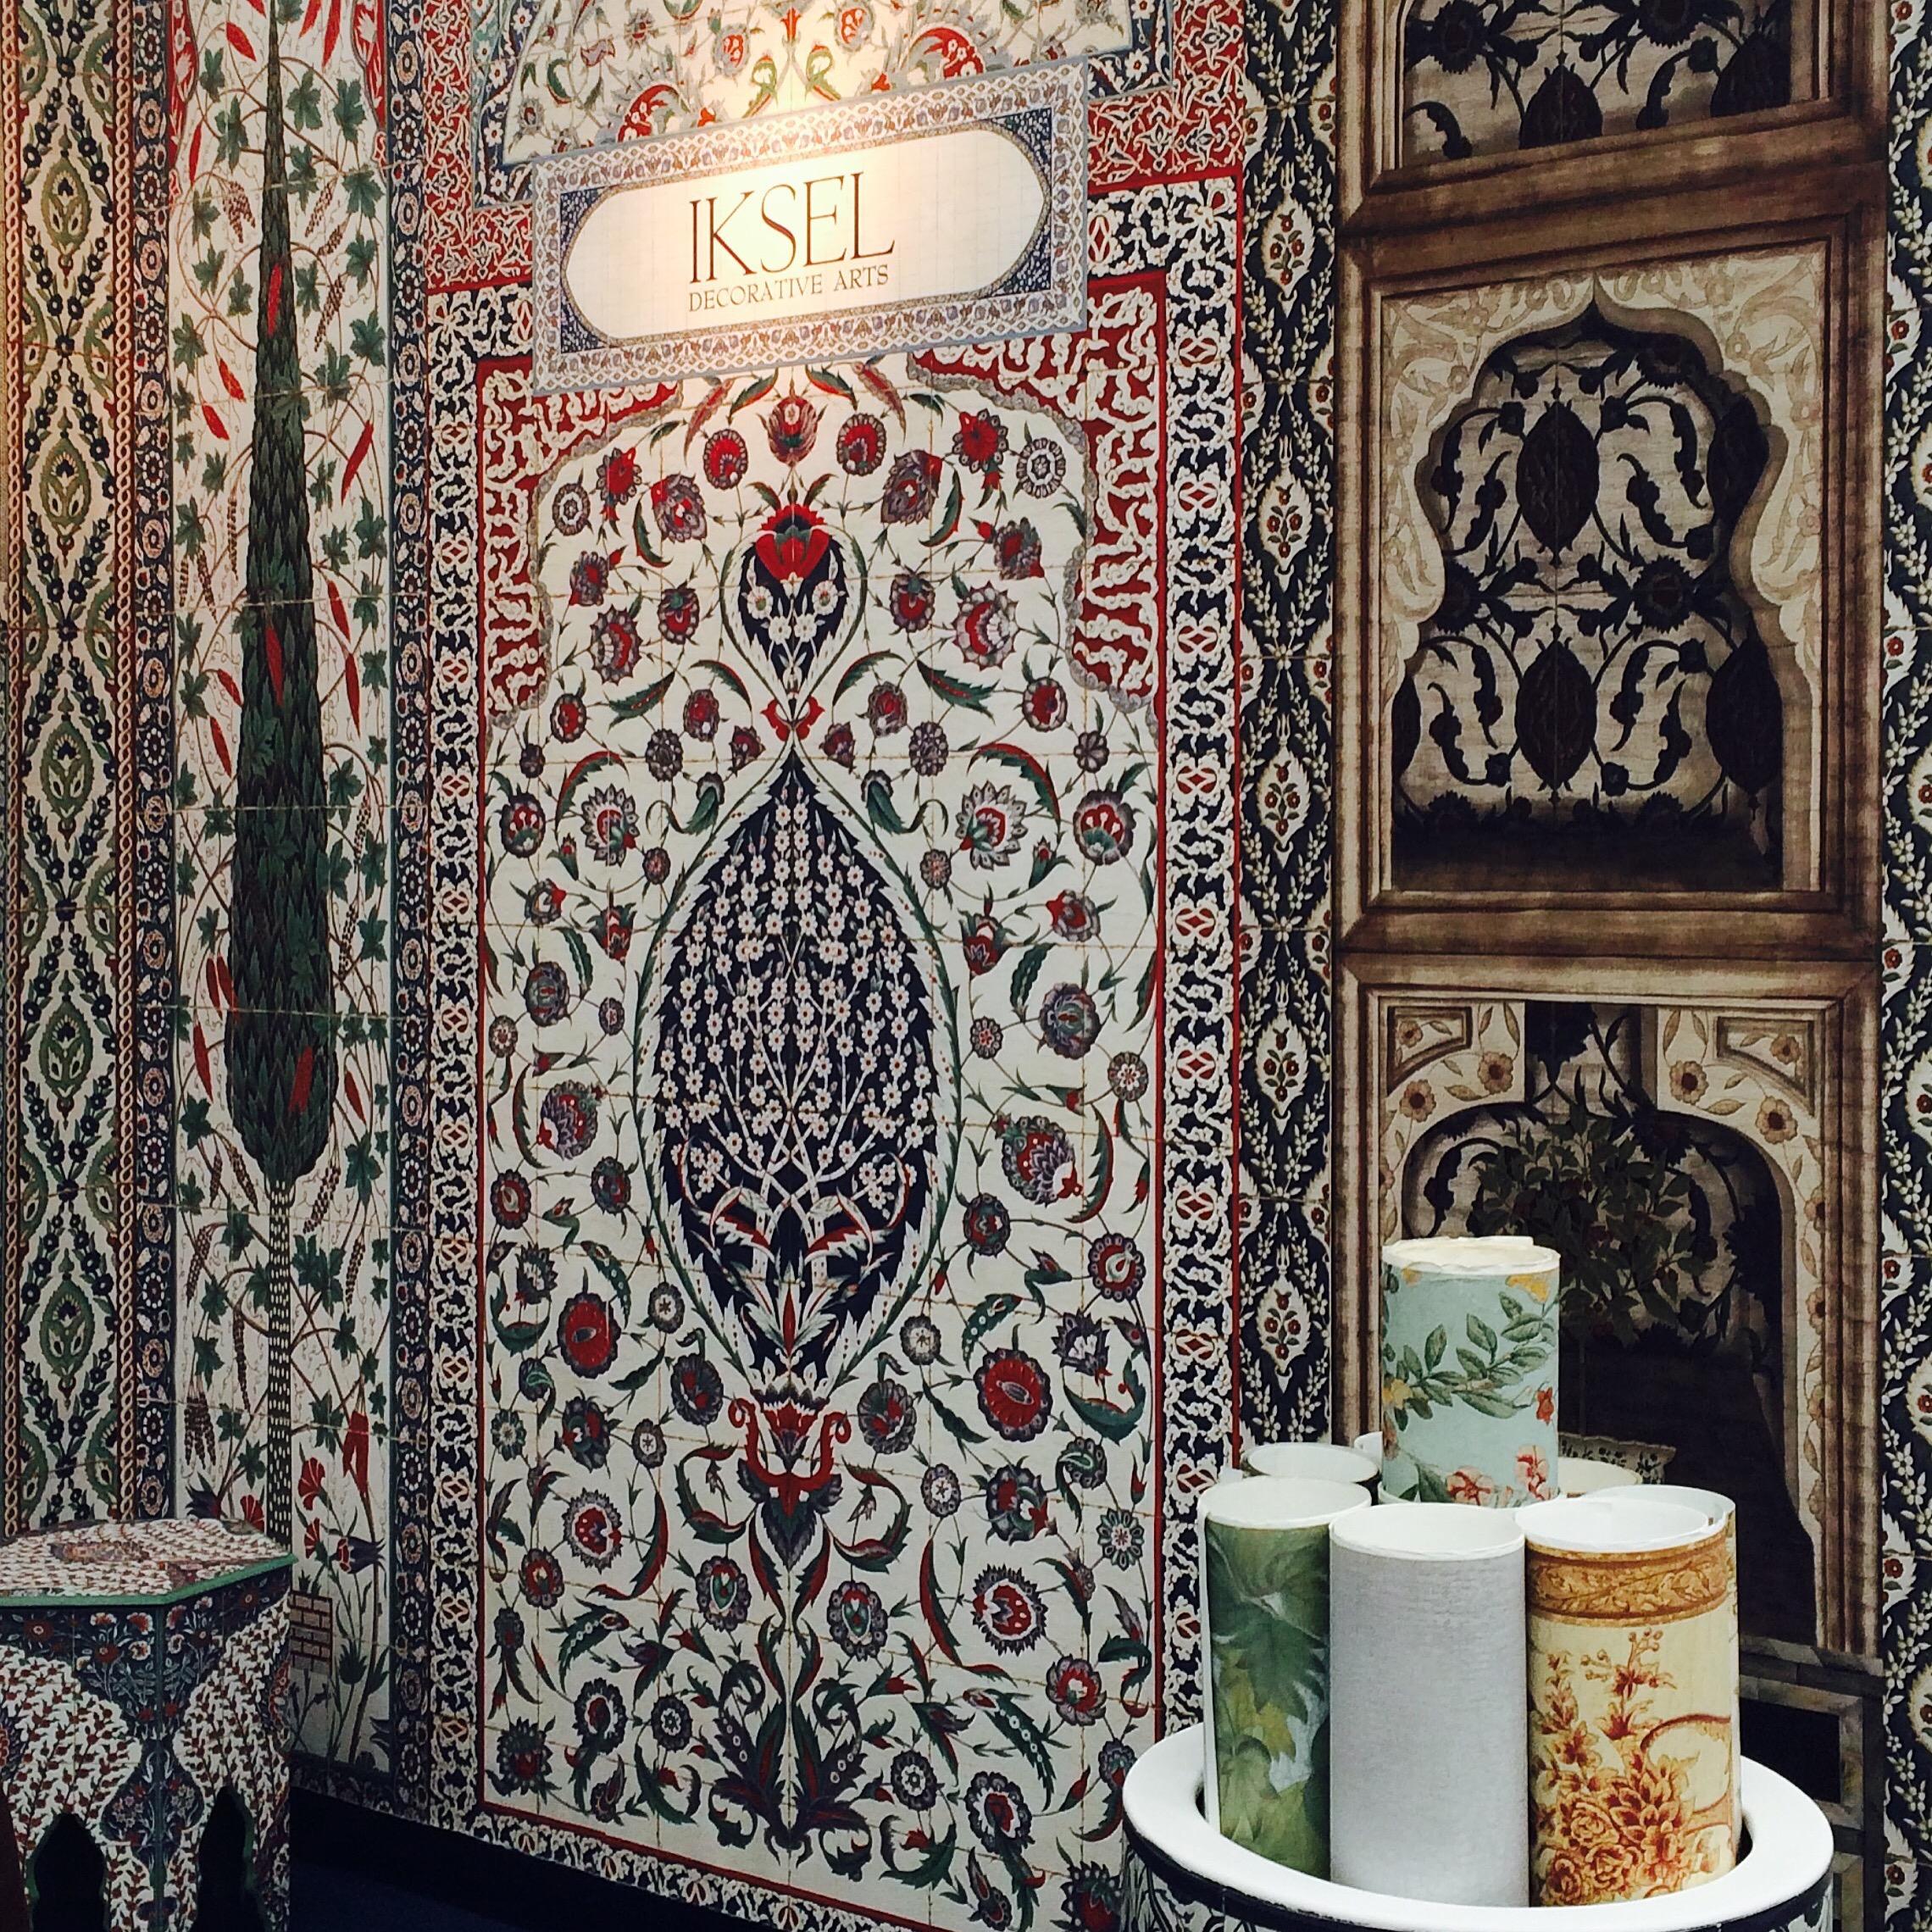 Iksel decorative panels